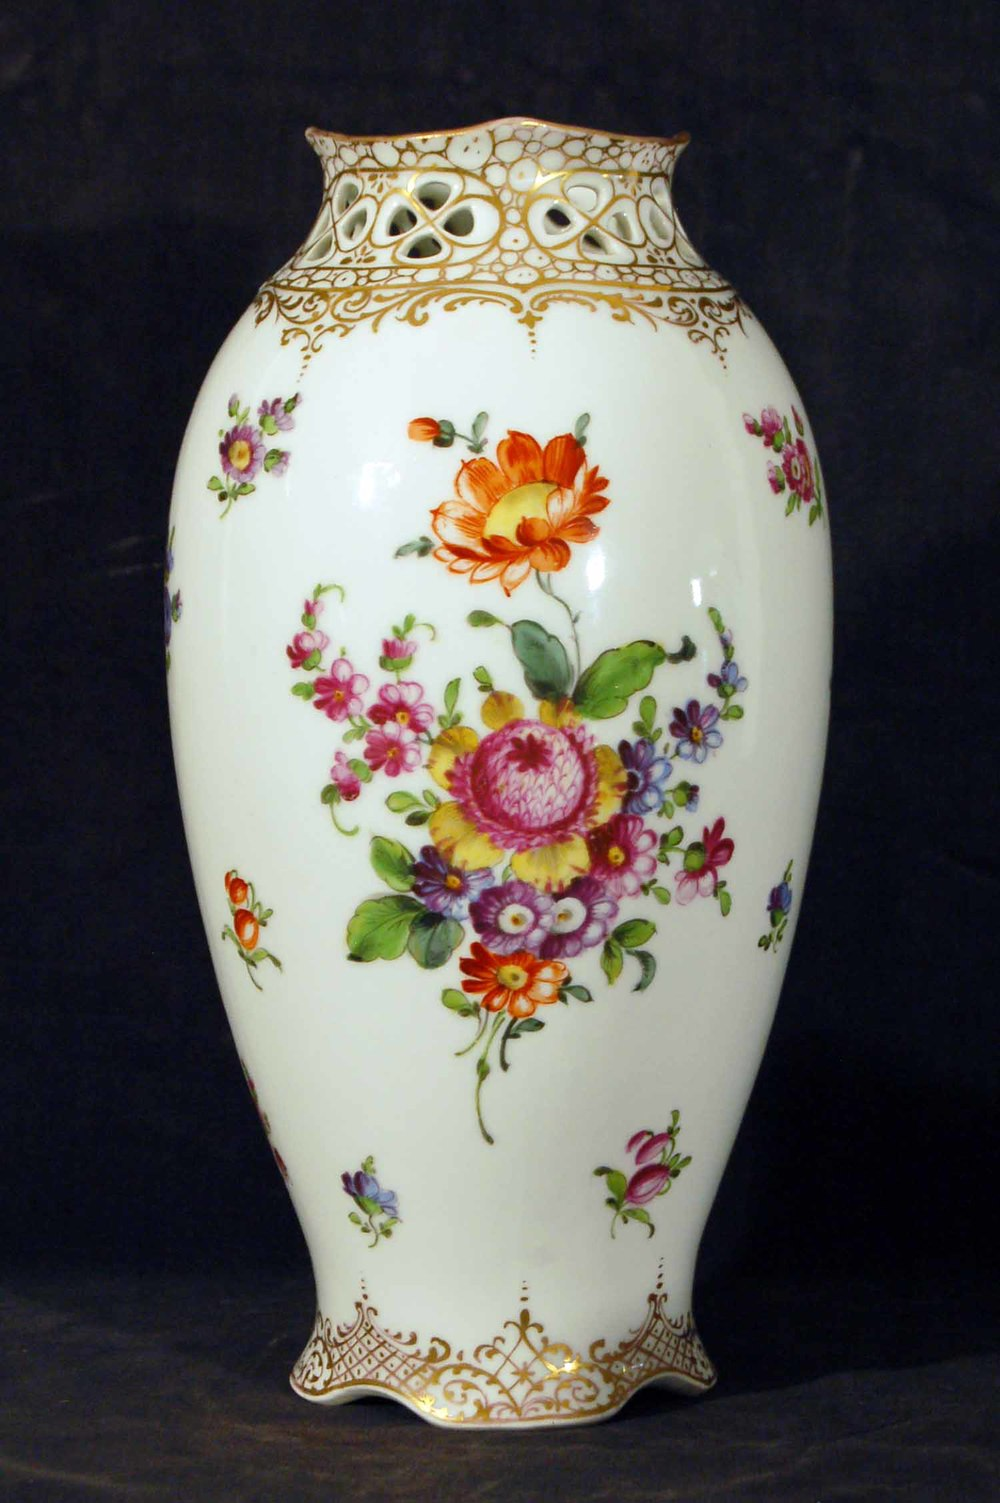 Porzellanvase bemalt, Blumendekor, Höhe ca. 25cm